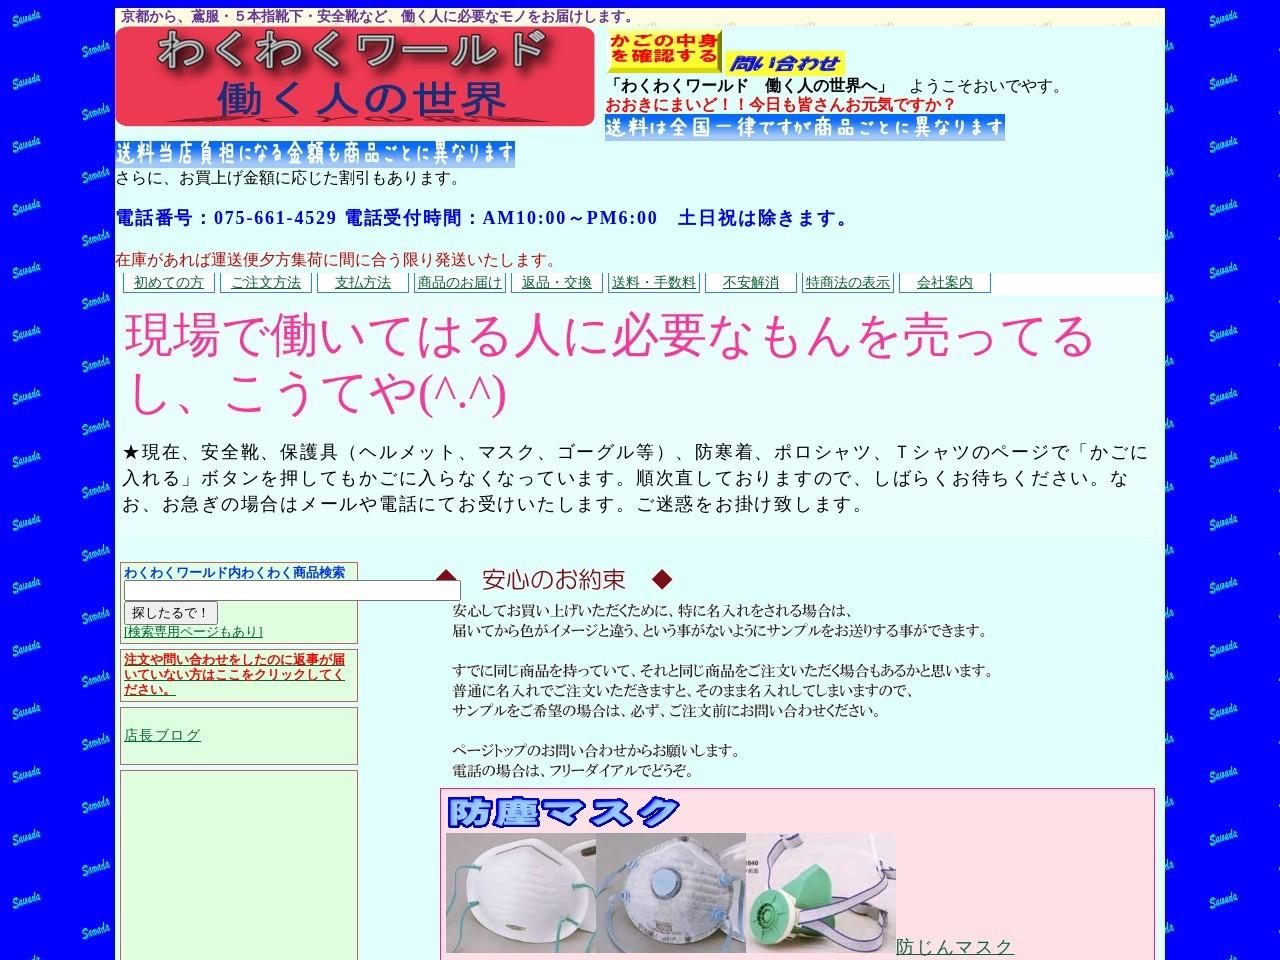 【W×3】京都発ー鳶服・5本指靴下・安全靴の通販:わくわくワールド 働く人の世界